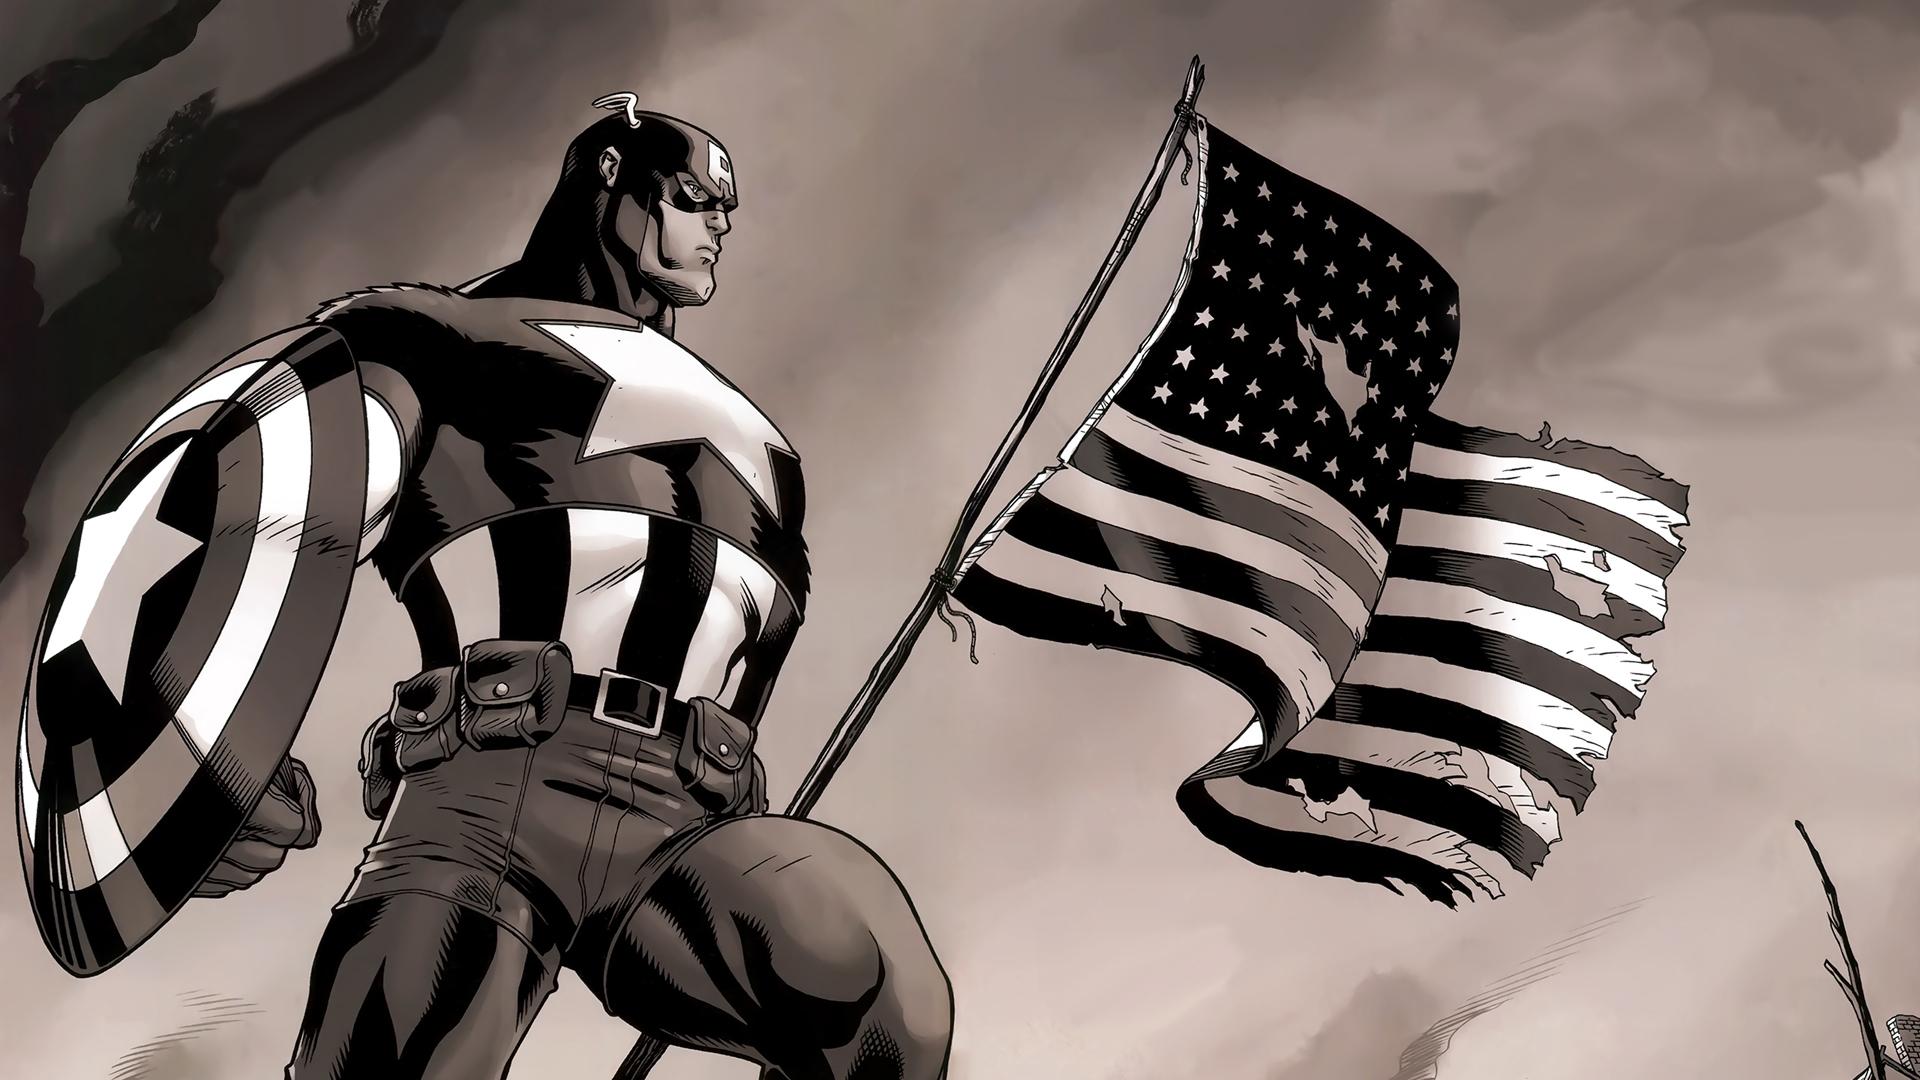 marvel wallpaper comics captain america comic book Captain America 1920x1080